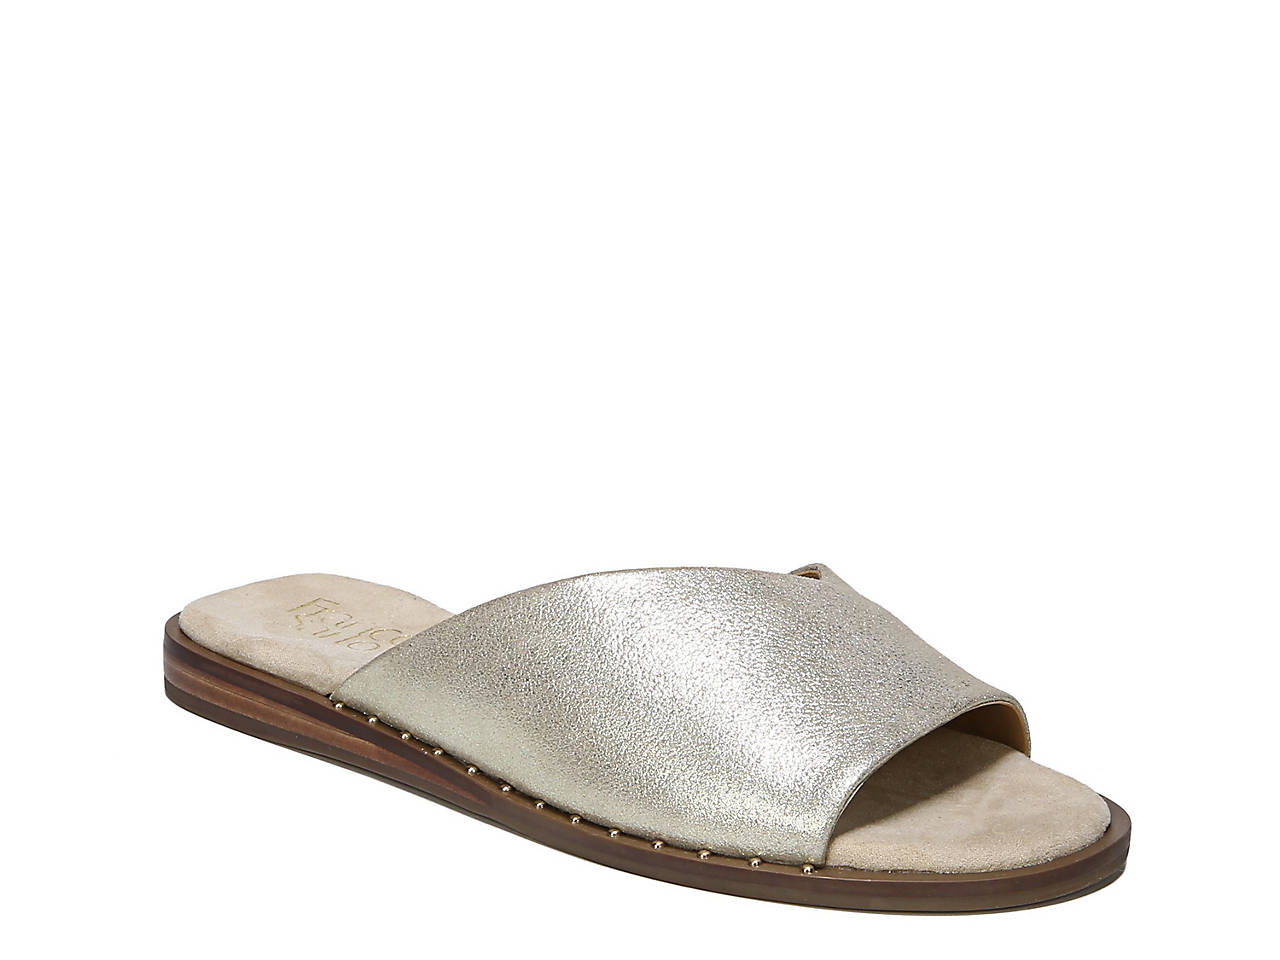 1db106a7ddd Franco Sarto Riviera Flat Sandal Women s Shoes